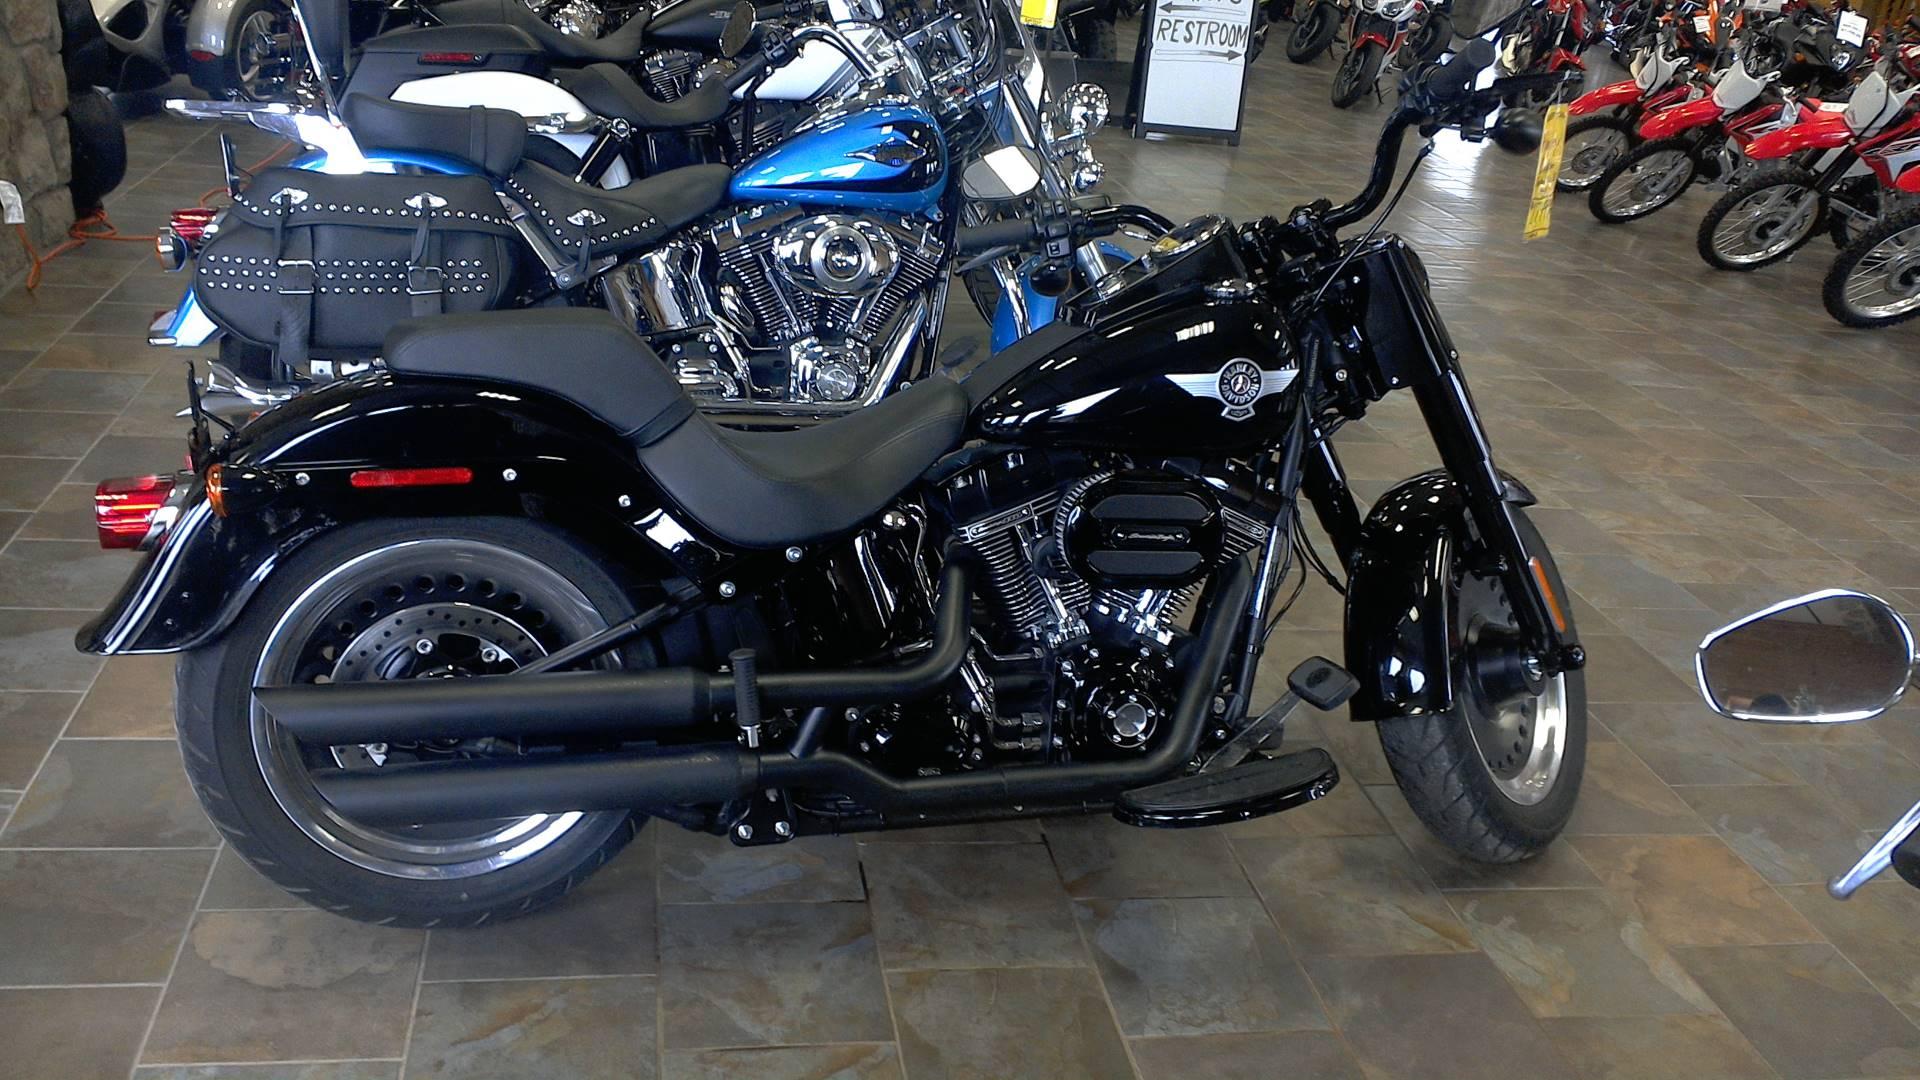 used 2016 harley davidson fat boy lo motorcycles in. Black Bedroom Furniture Sets. Home Design Ideas